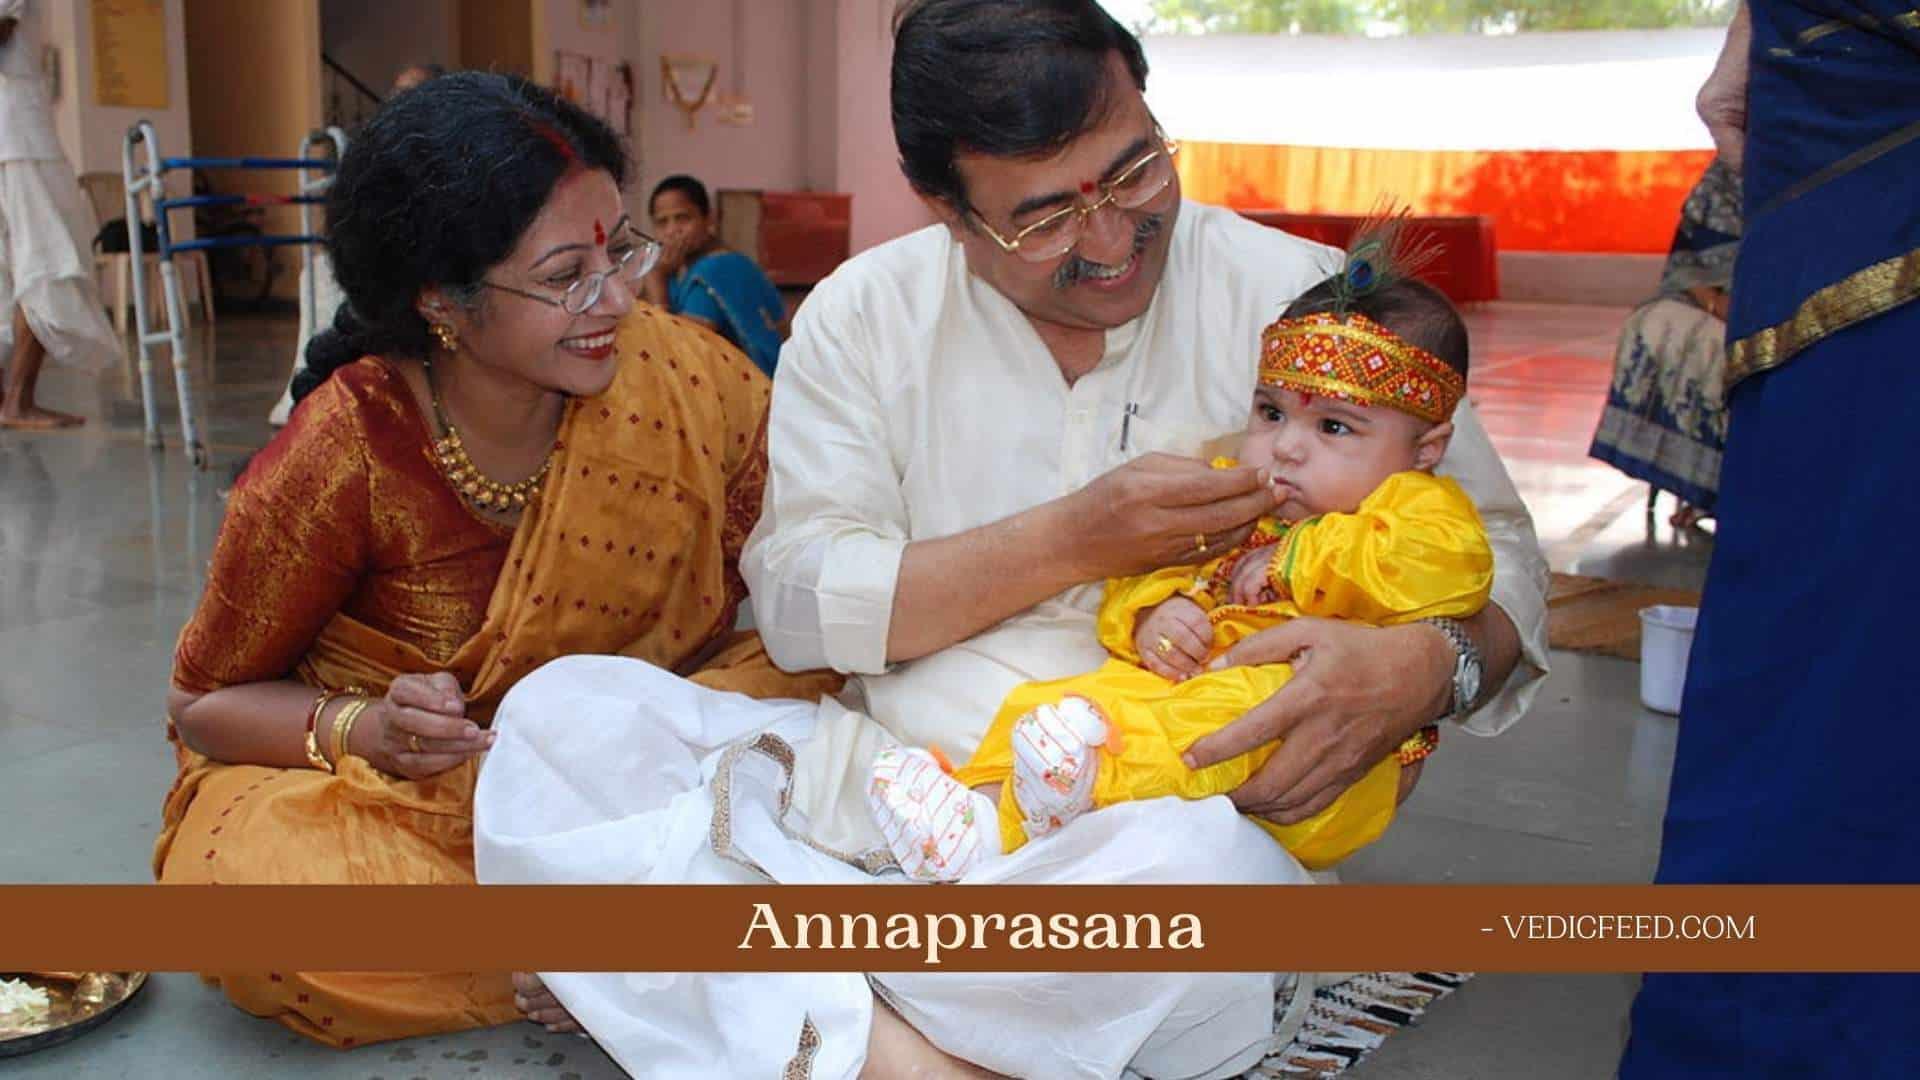 Annaprasana - Rice Feeding Ceremony in Hinduism